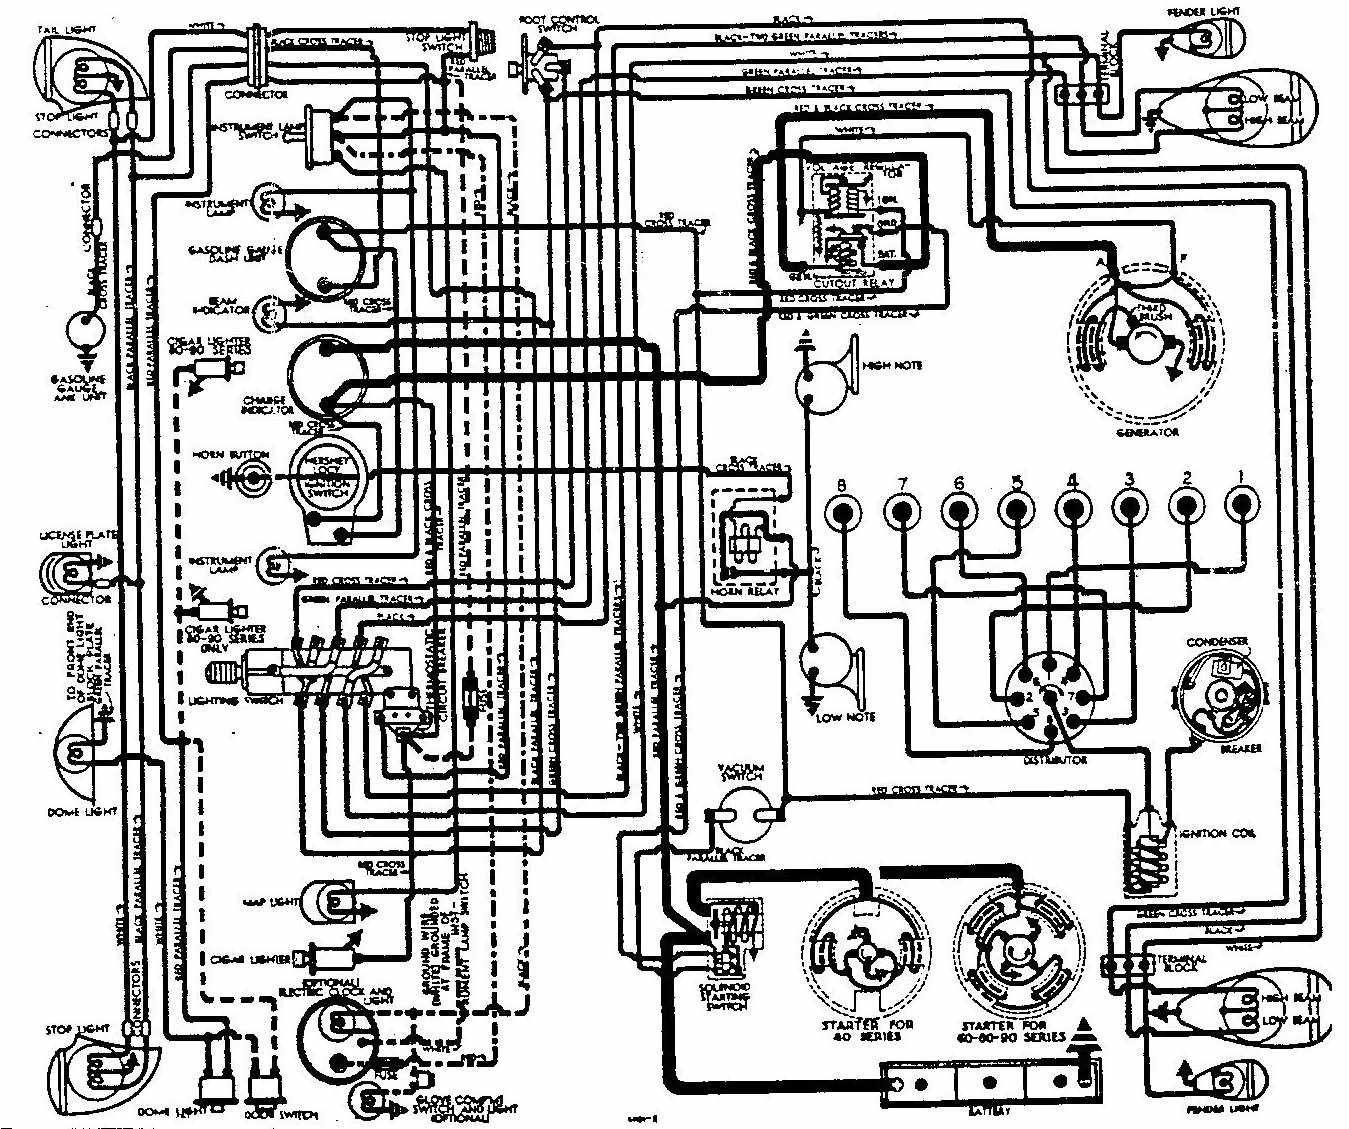 1995 buick roadmaster wiring diagram schematic